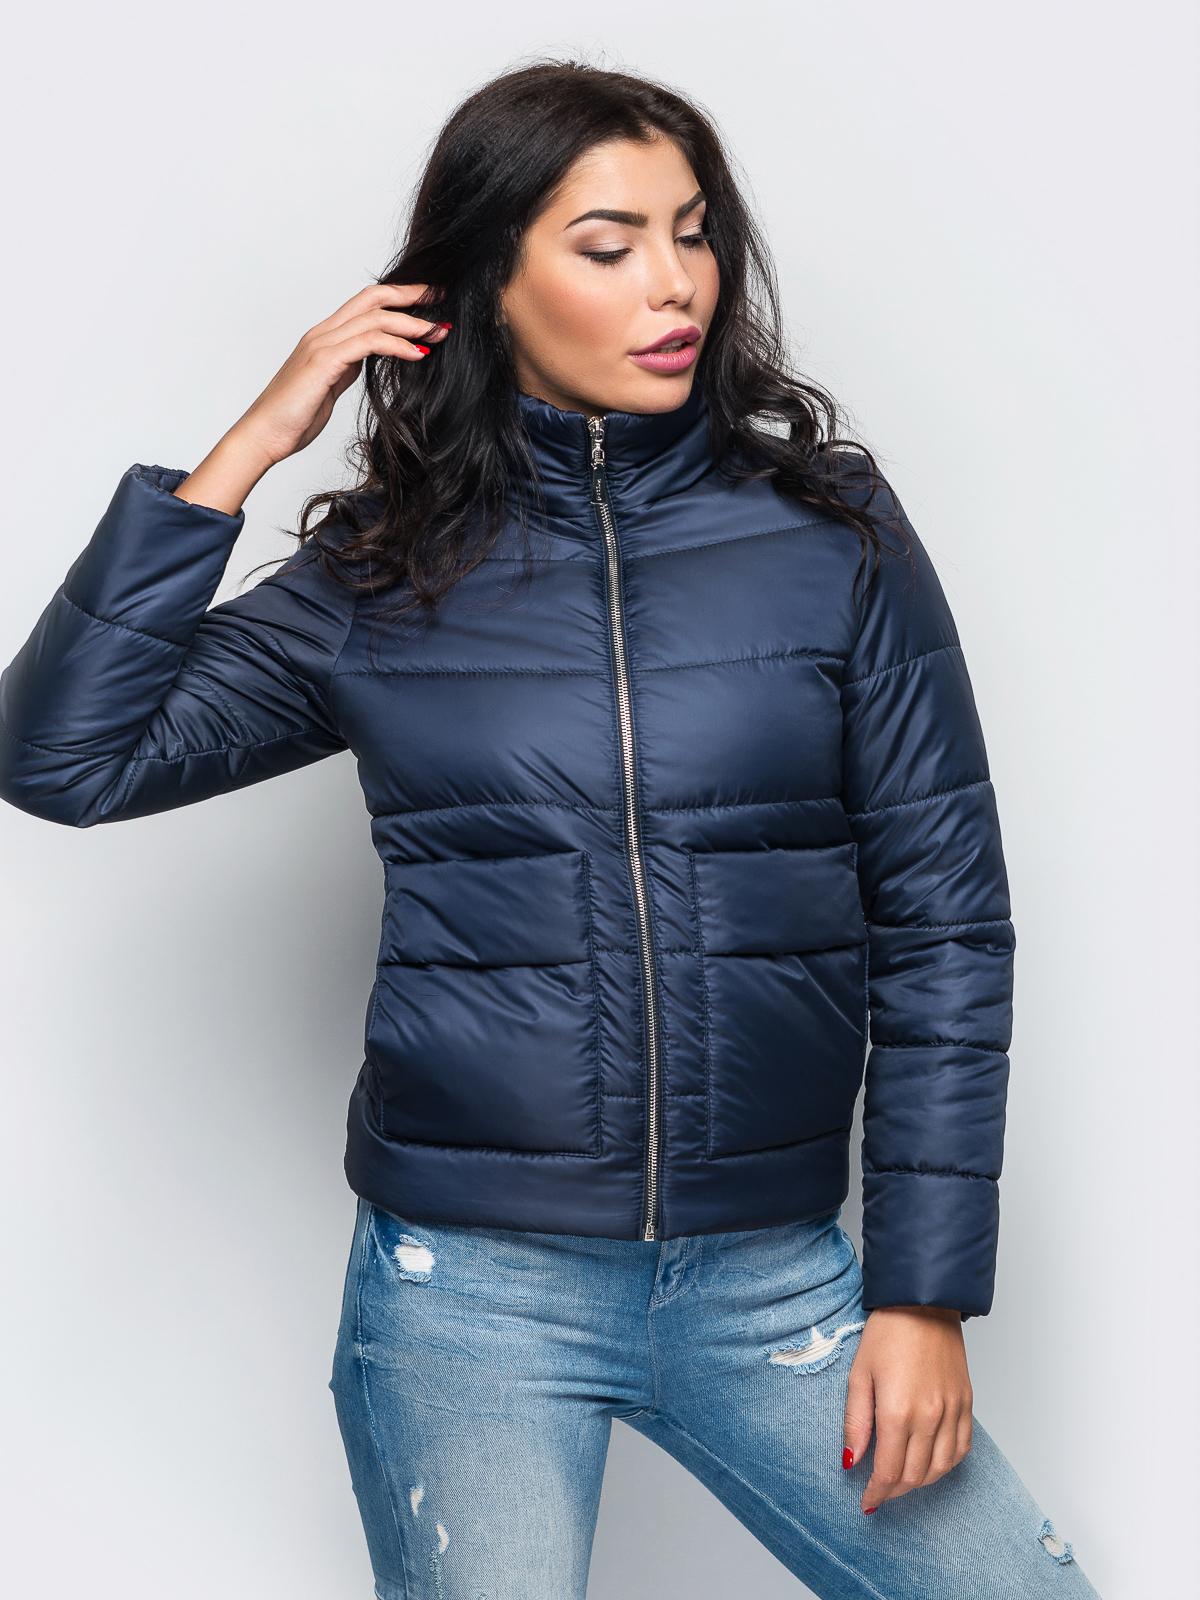 Тёмно-синяя демисезонная куртка с накладными карманами 15178, фото 1